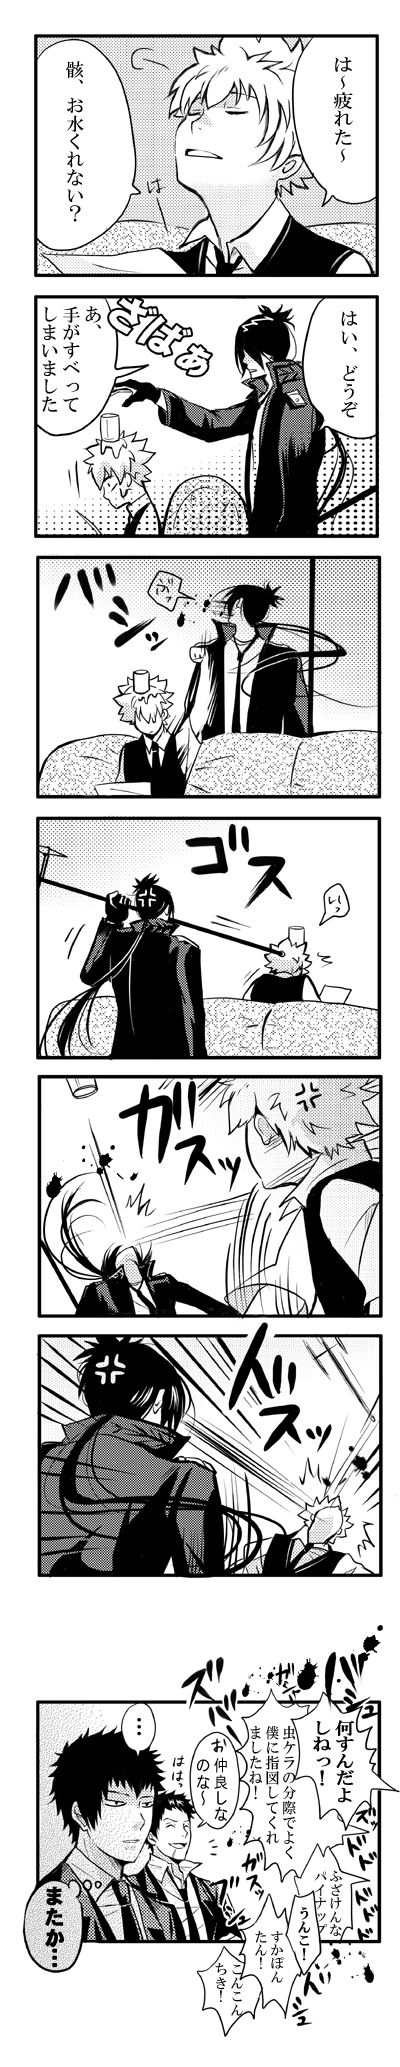 Katekyo Hitman REBORN! Mukuro and Tsuna. The (childish) fight ensues!